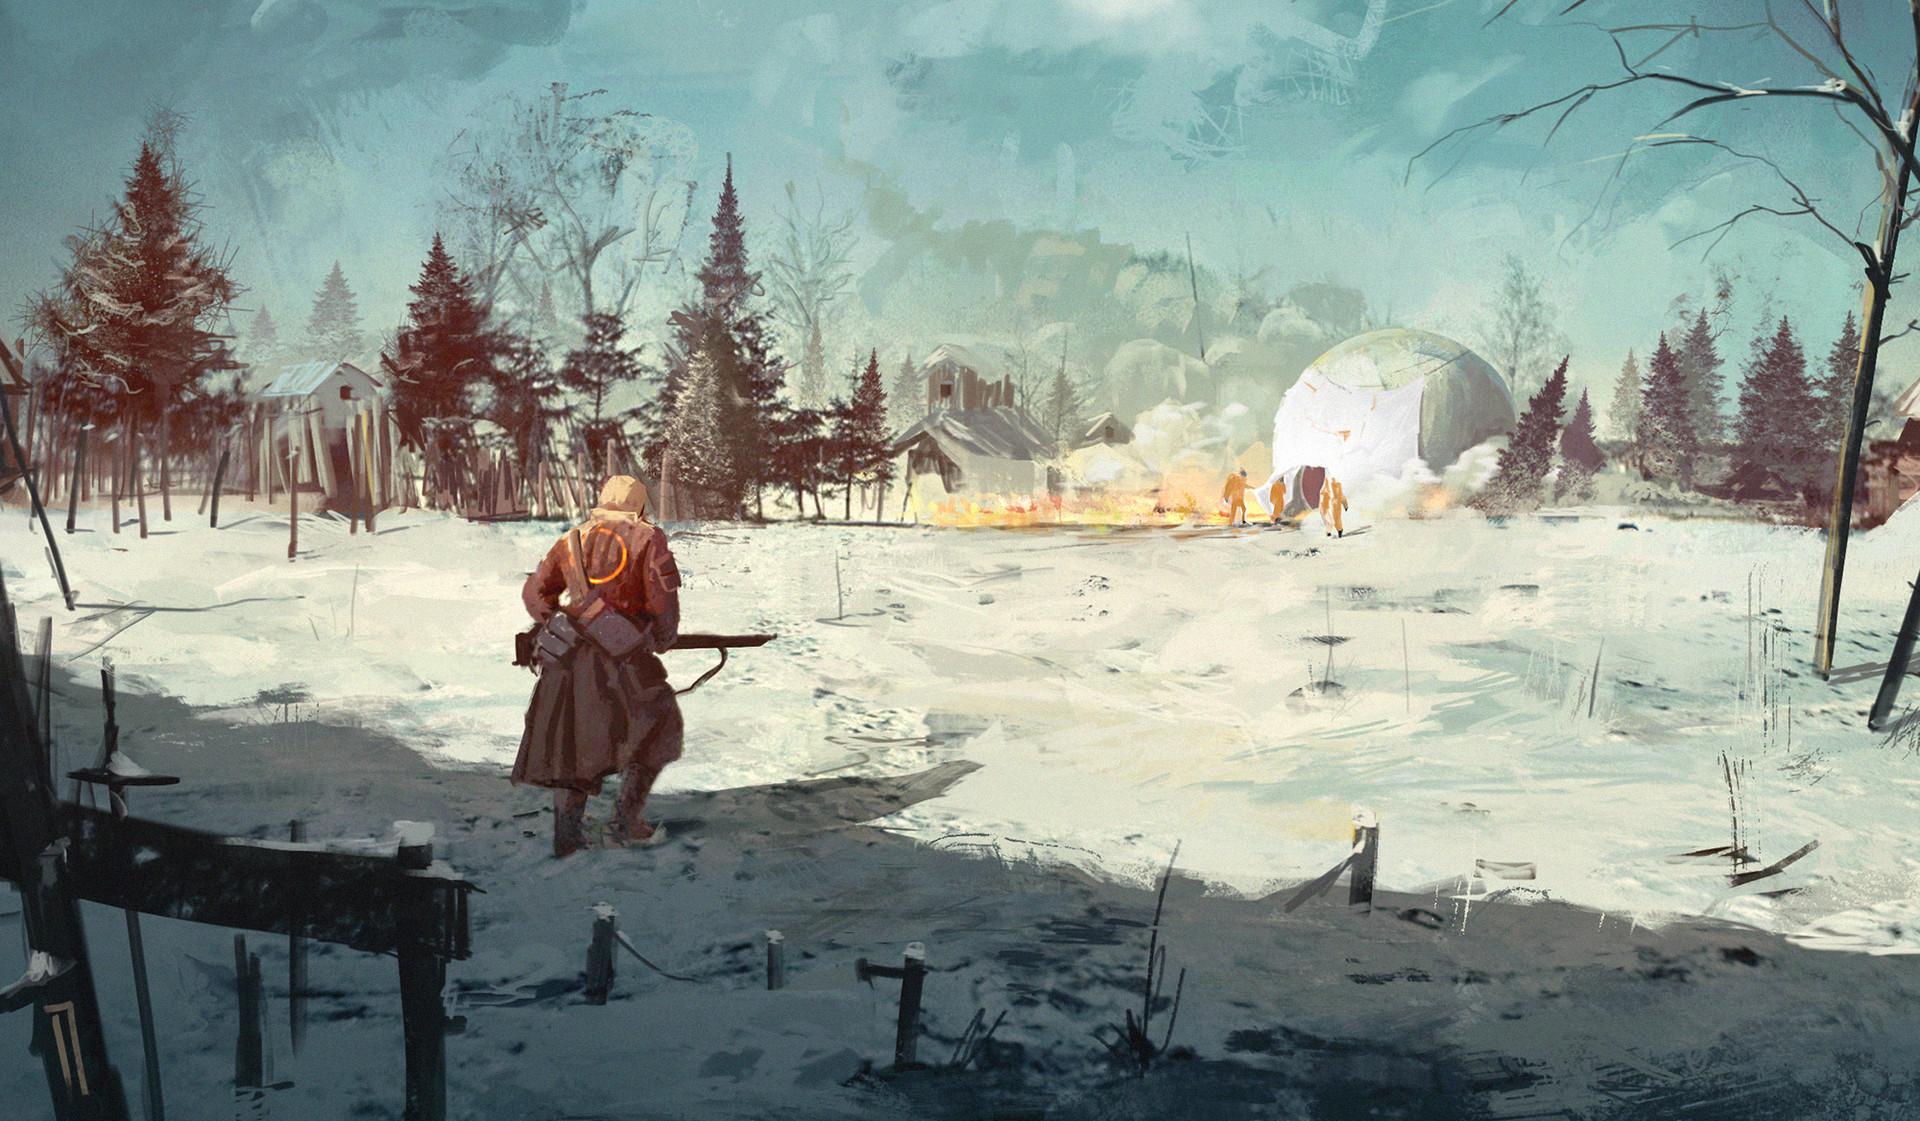 General 1920x1121 Ismail Inceoglu concept art men winter snow clothes nature gun